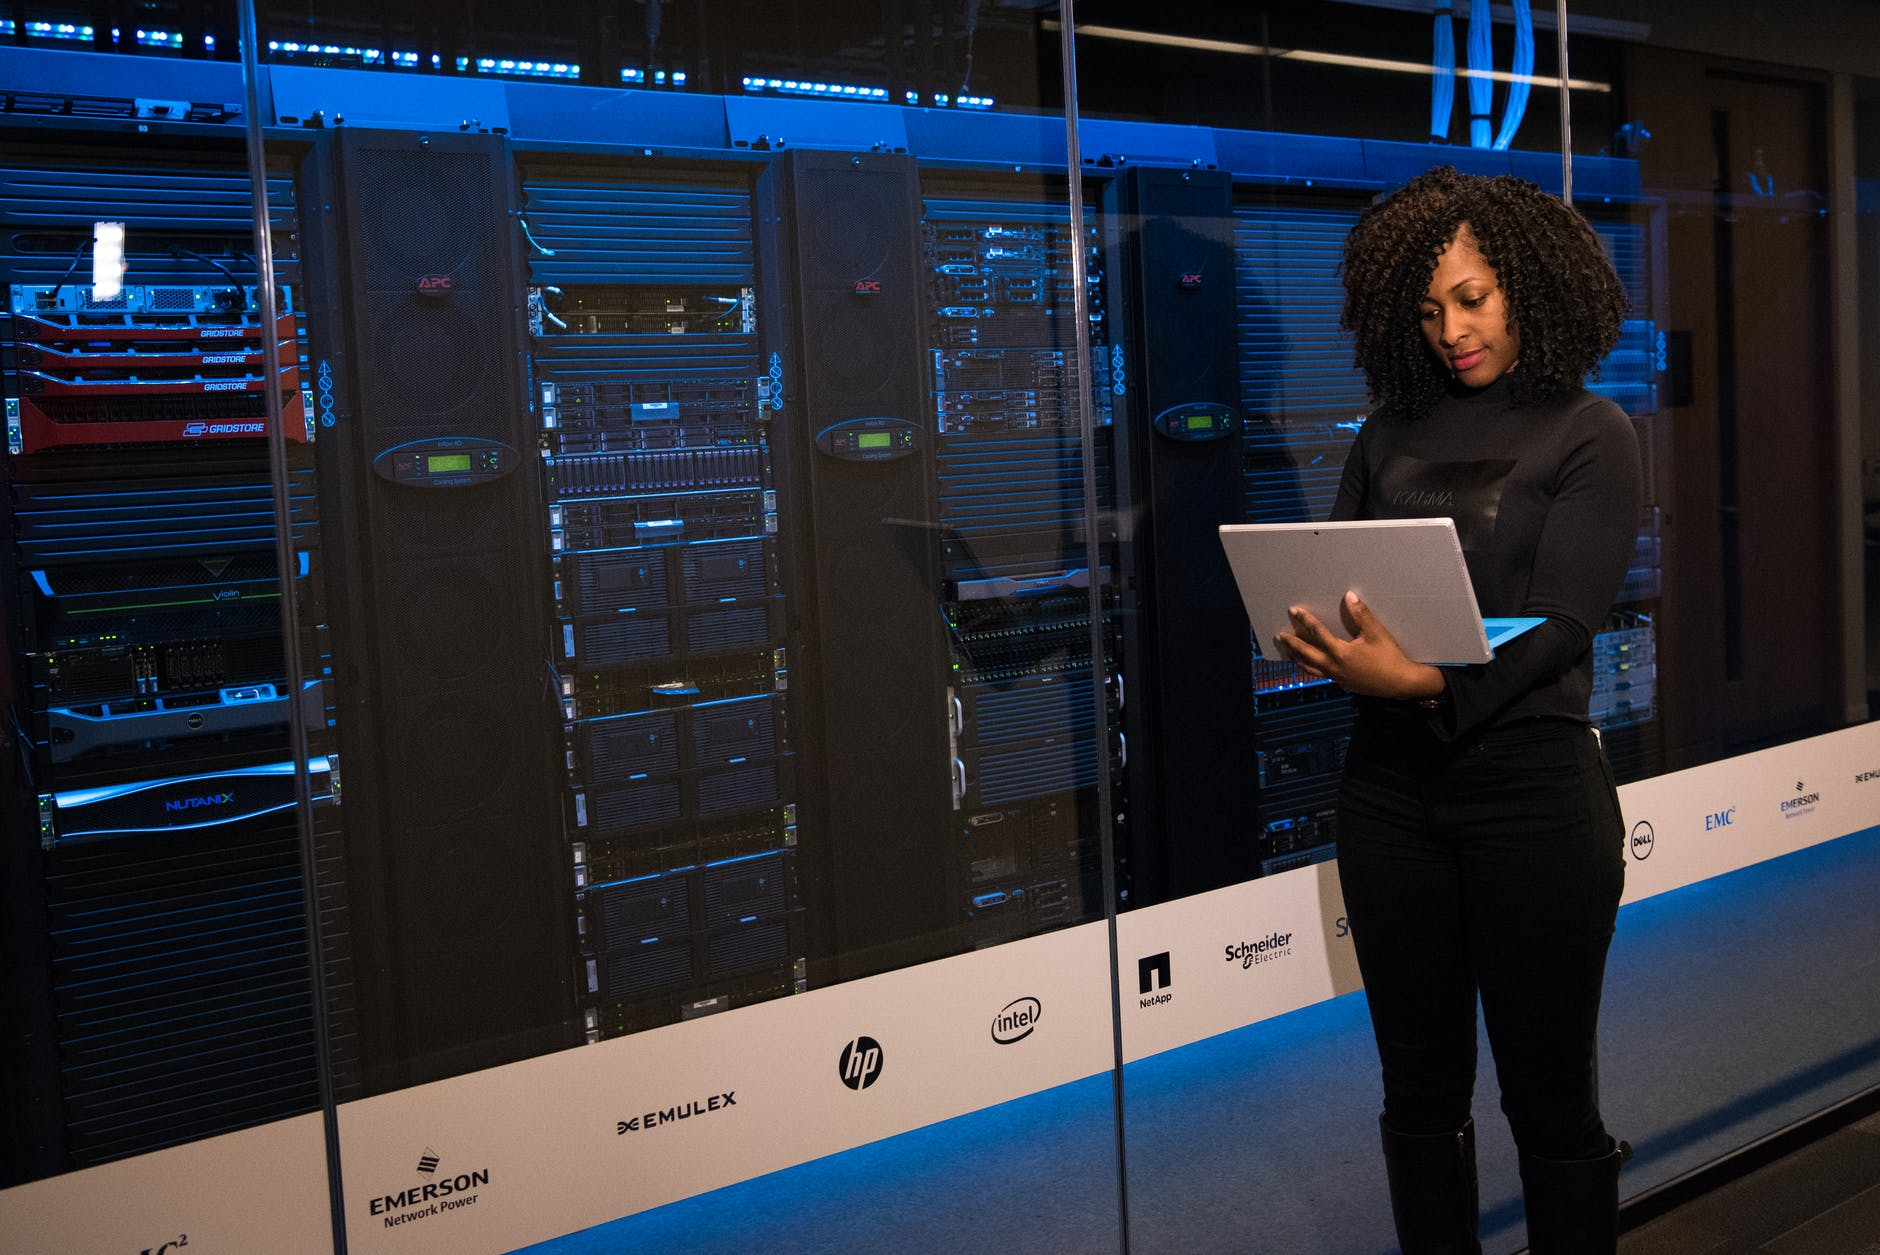 software engineer standing beside server racks